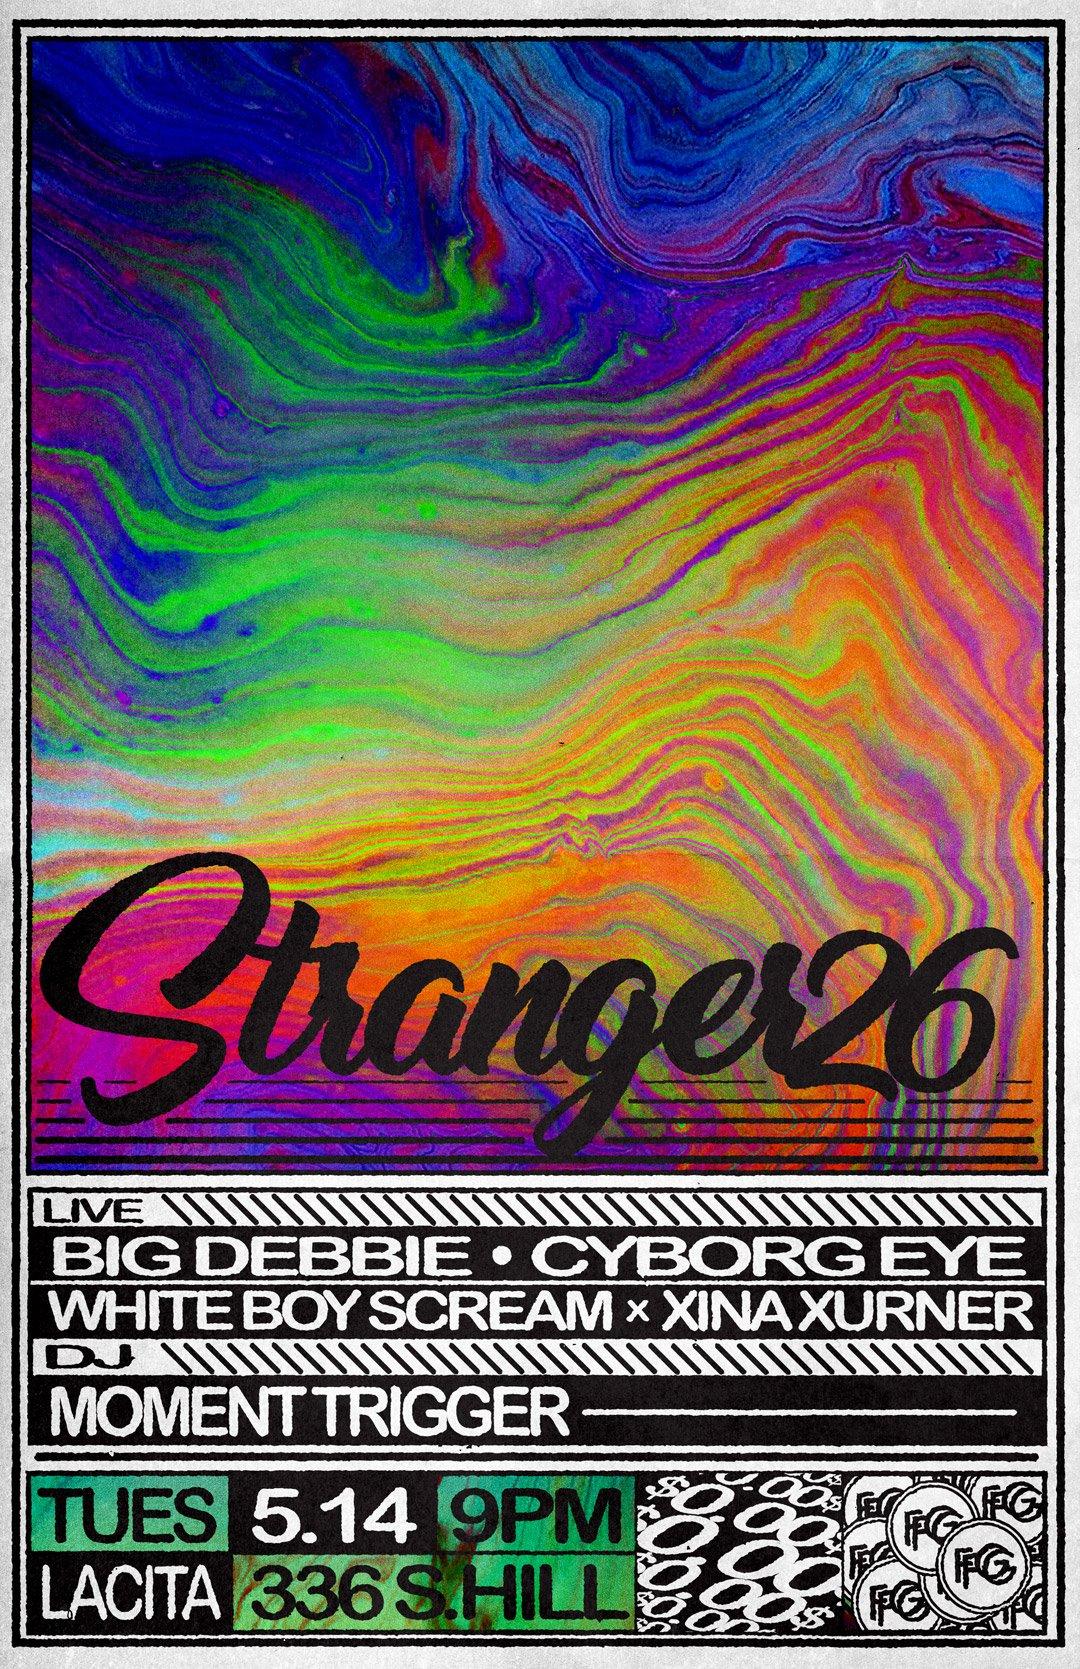 /////STRANGER 26////// -------- LIVE: -------- -BIG DEBBIE (RECORD RELEASE)  https://ratskinrecords.bandcamp.com/album/ab-ra-ca-deb-ra  -------- -CYBORG EYE  https://ratskinrecords.bandcamp.com/album/demo-1983  -------- -WHITE BOY SCREAM X XINA XURNER  https://xinaxurner.bandcamp.com/   https://wbscream.bandcamp.com/  -------- DJS: -------- -MOMENT TRIGGER -DANDYMAN -------- $0.00 :) --------  www.fattgrabbers.com  §§§